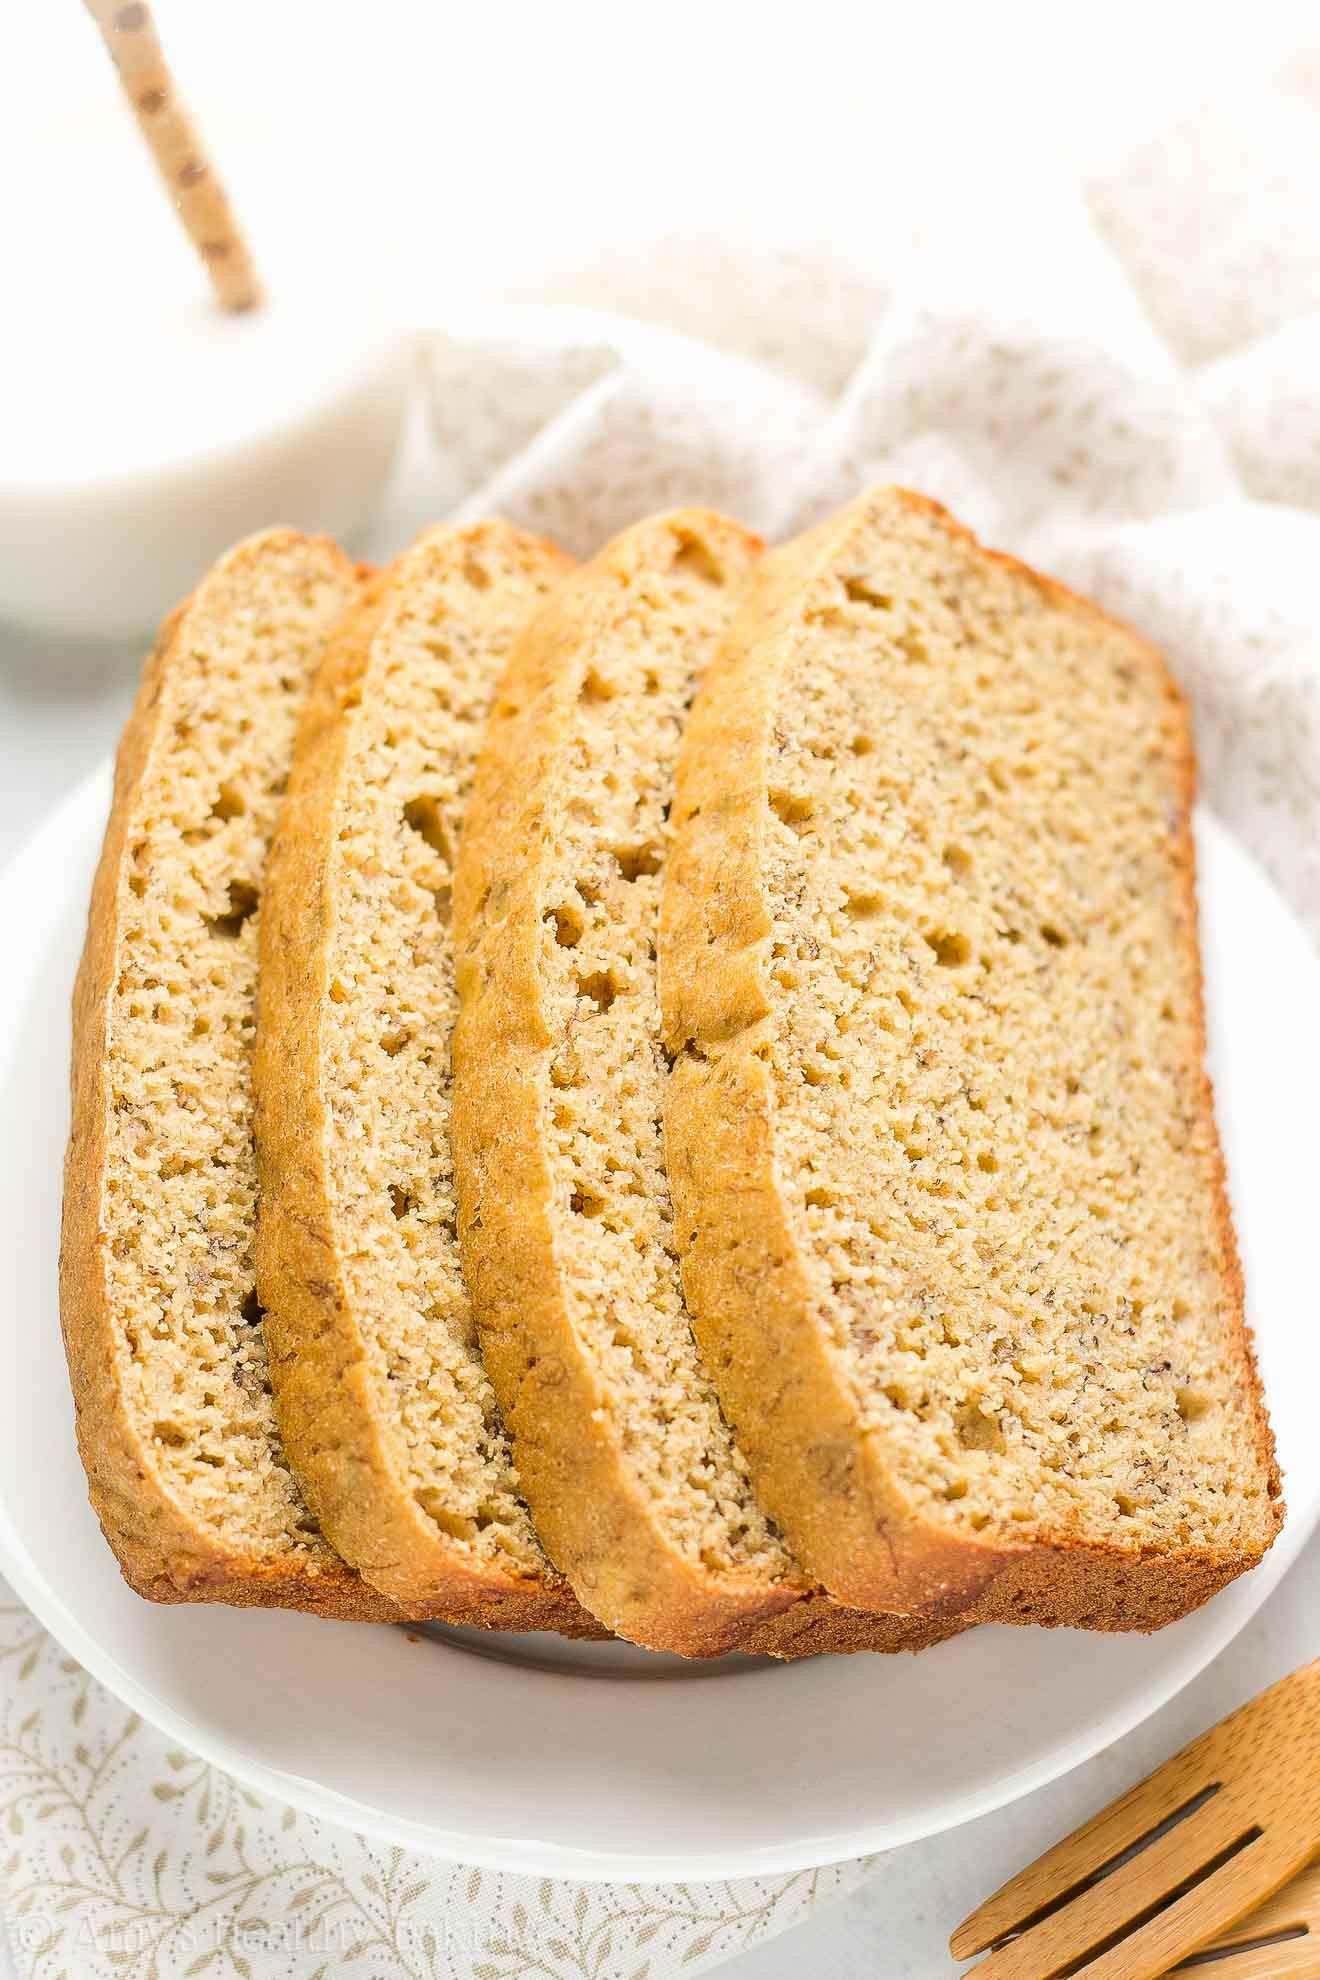 Healthy Bake Bread  The Ultimate Healthy Banana Bread